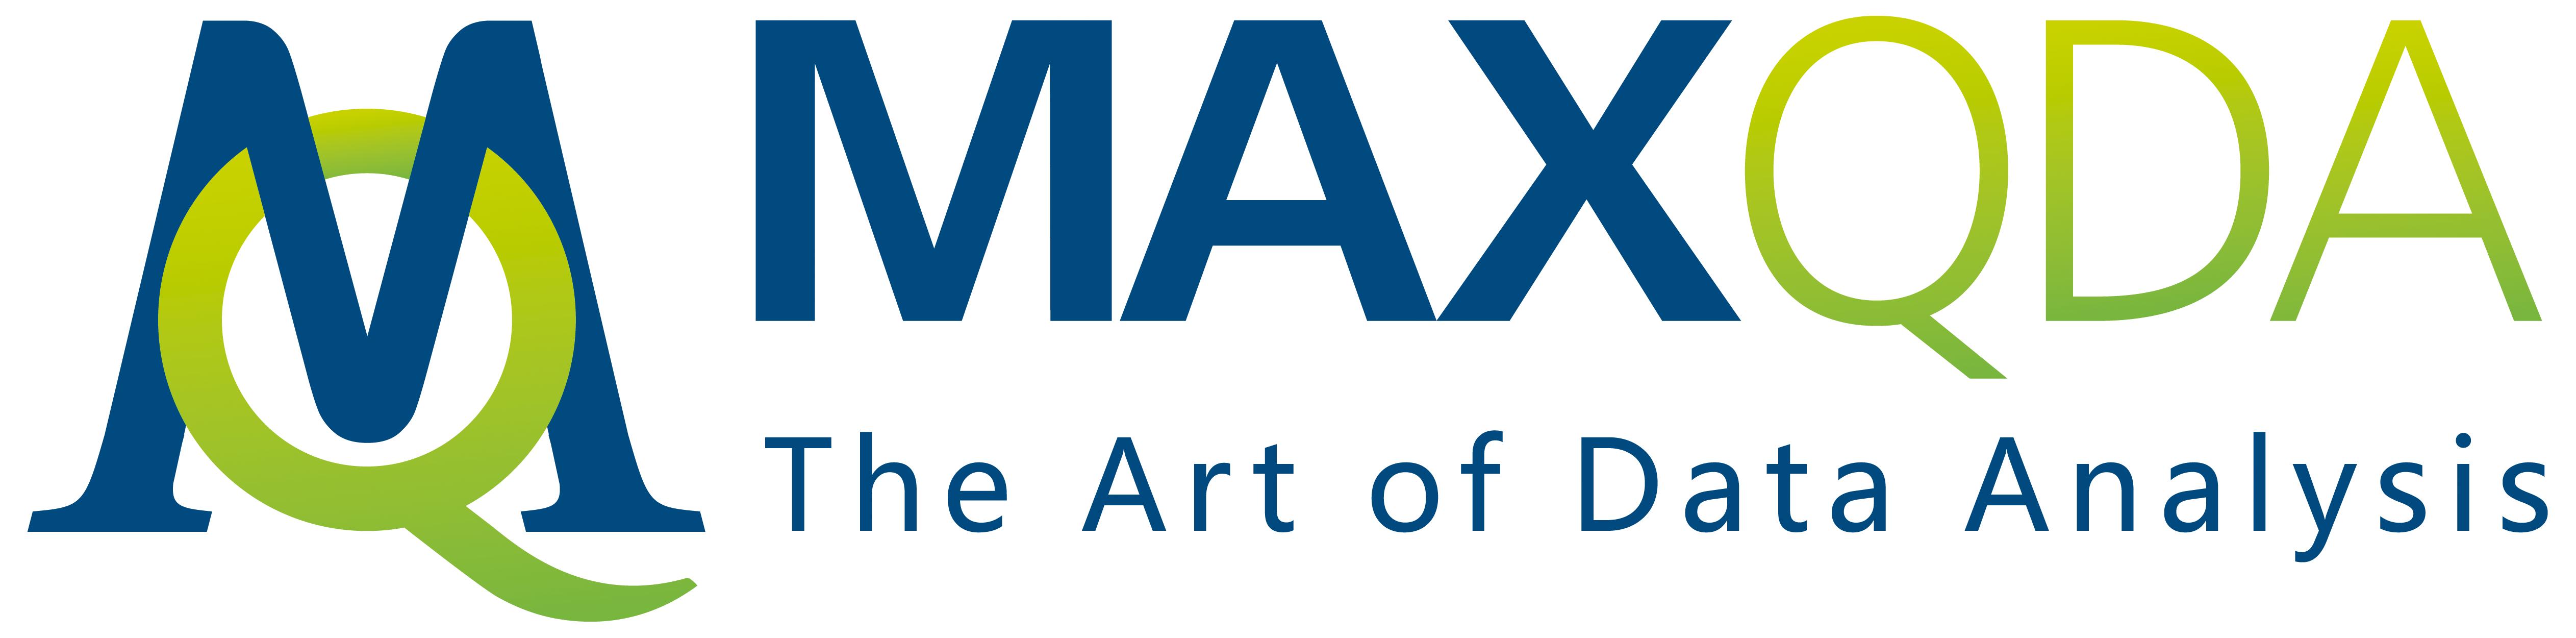 01-MAXQDA-Logo-white-bground